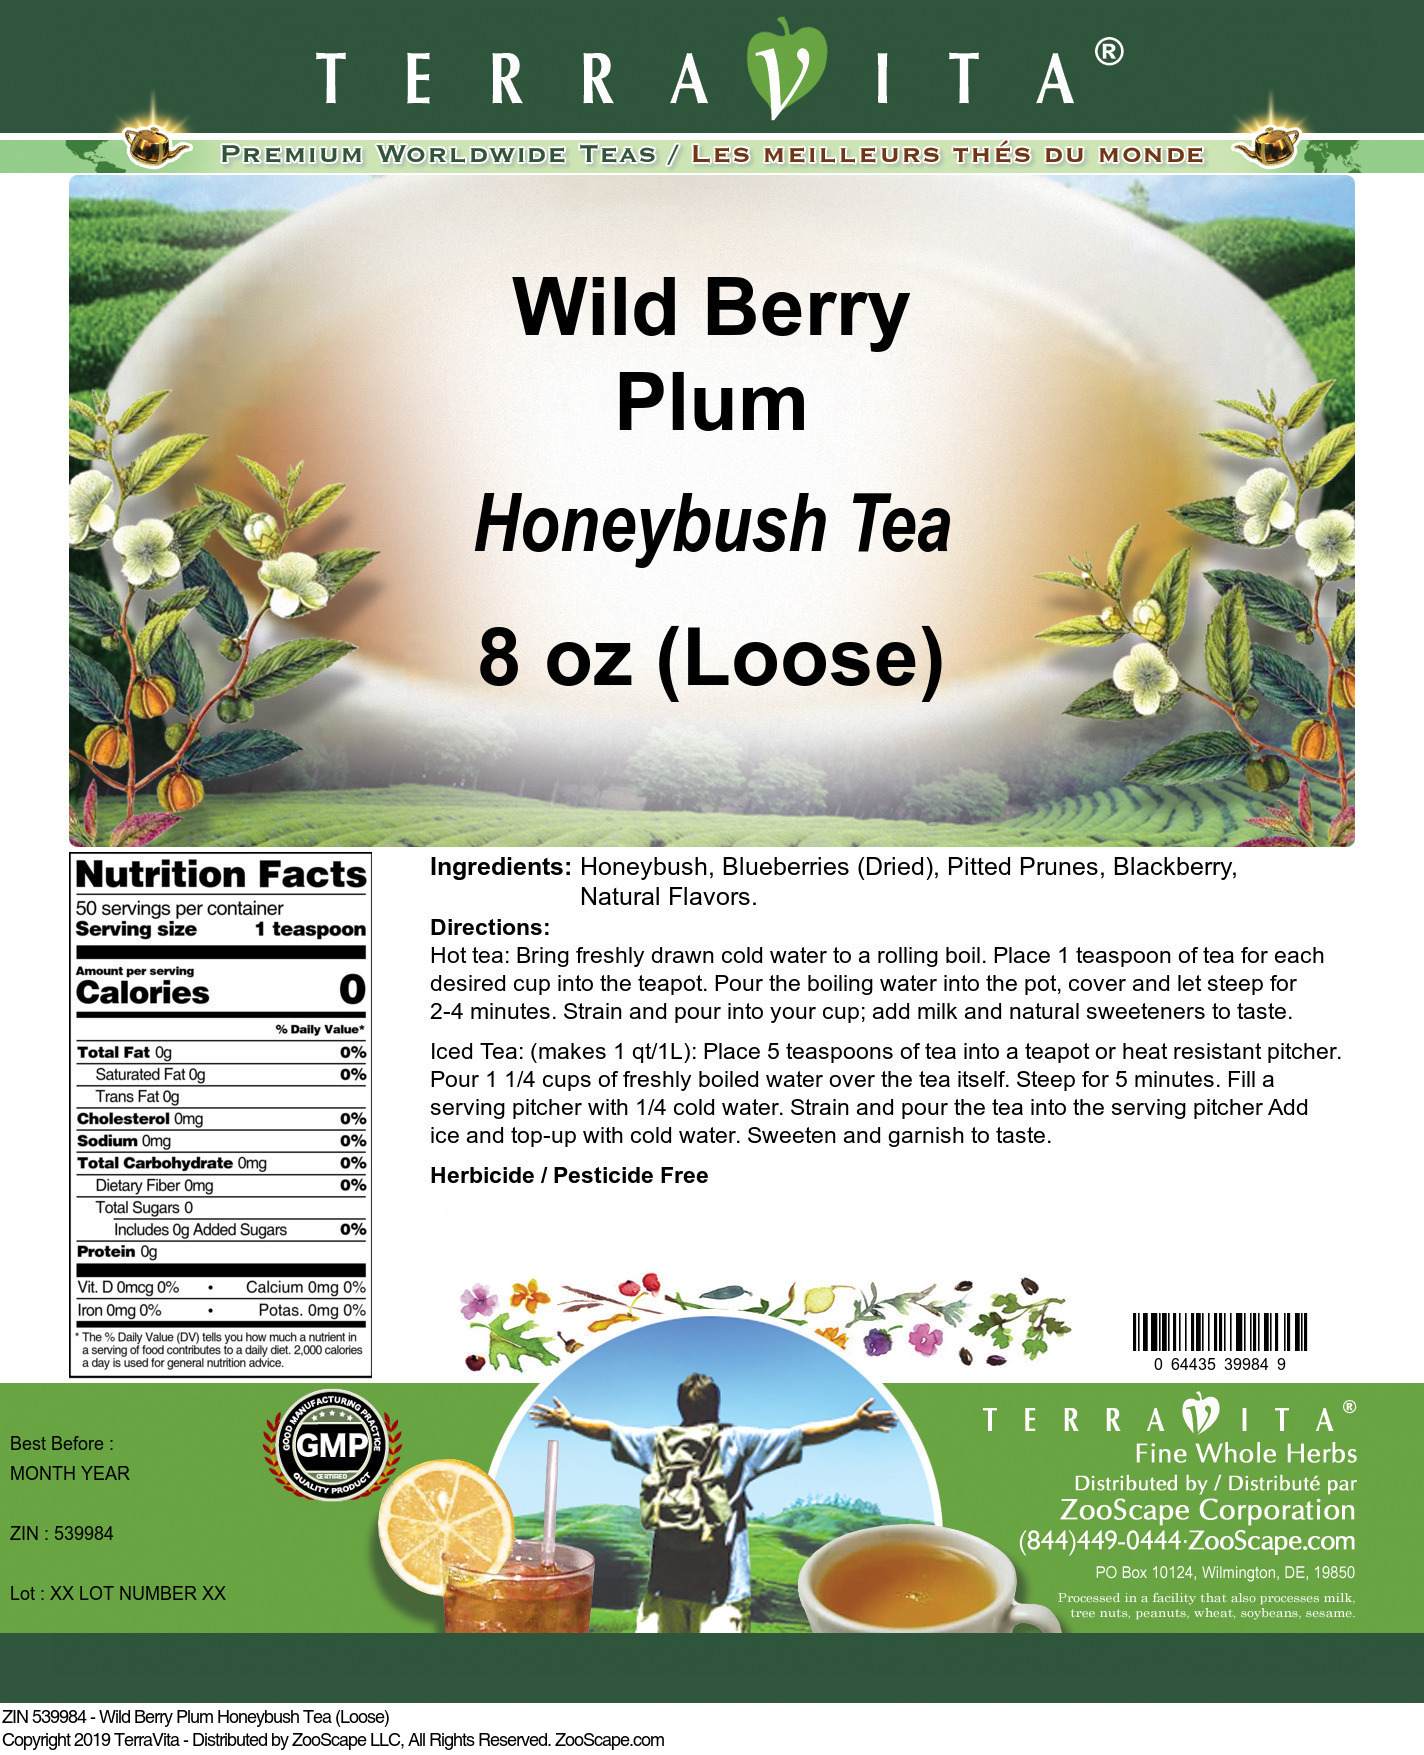 Wild Berry Plum Honeybush Tea